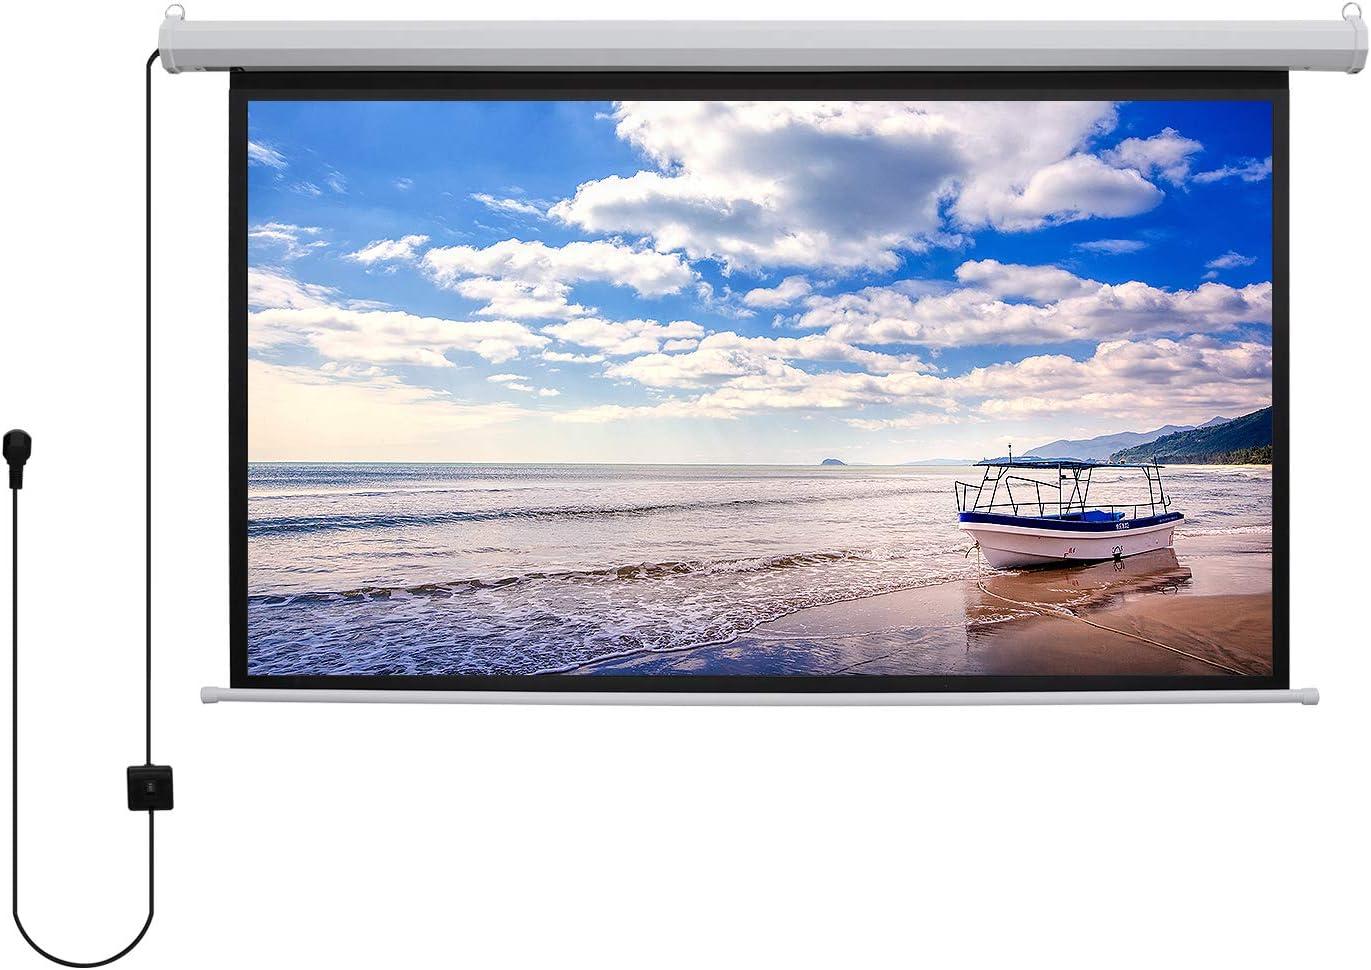 KPCB プロジェクタースクリーン 120インチ 電動 吊下げ式 シワのないスクリーン 自動収納でき スペース節約(16:9)